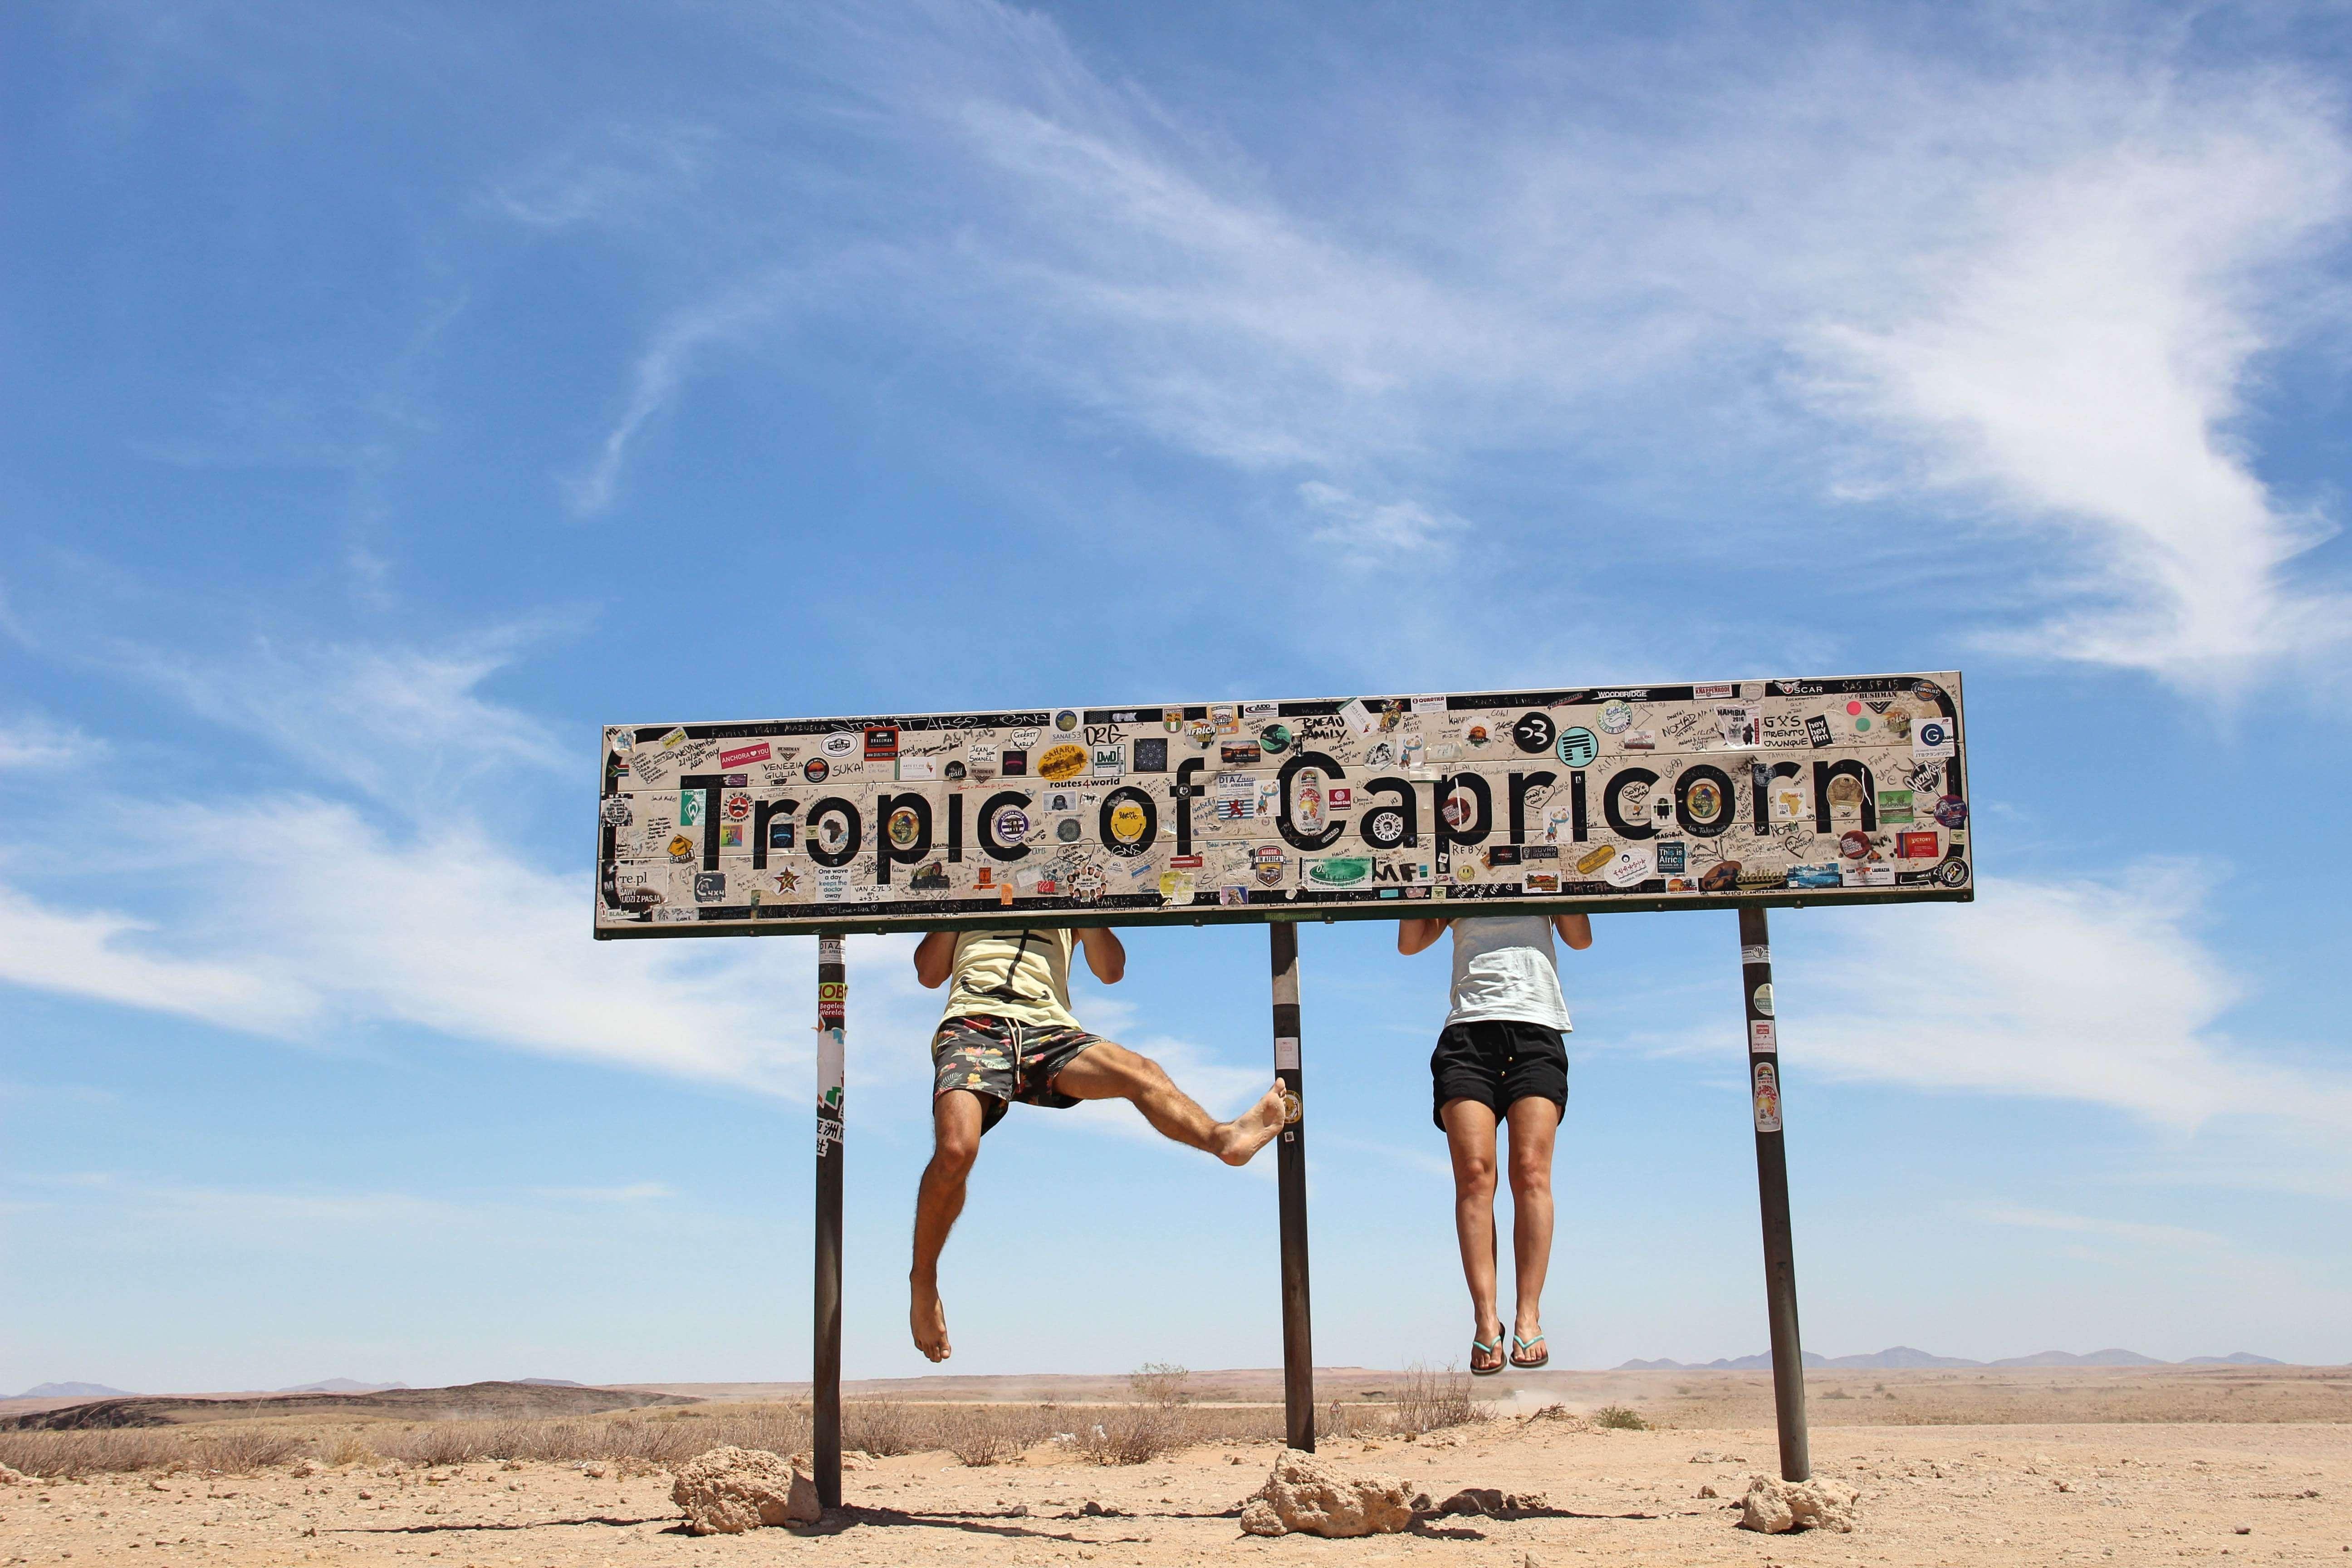 Weltreise_Backpacking_Namibia_Namib_Tropic_of_Capricorn